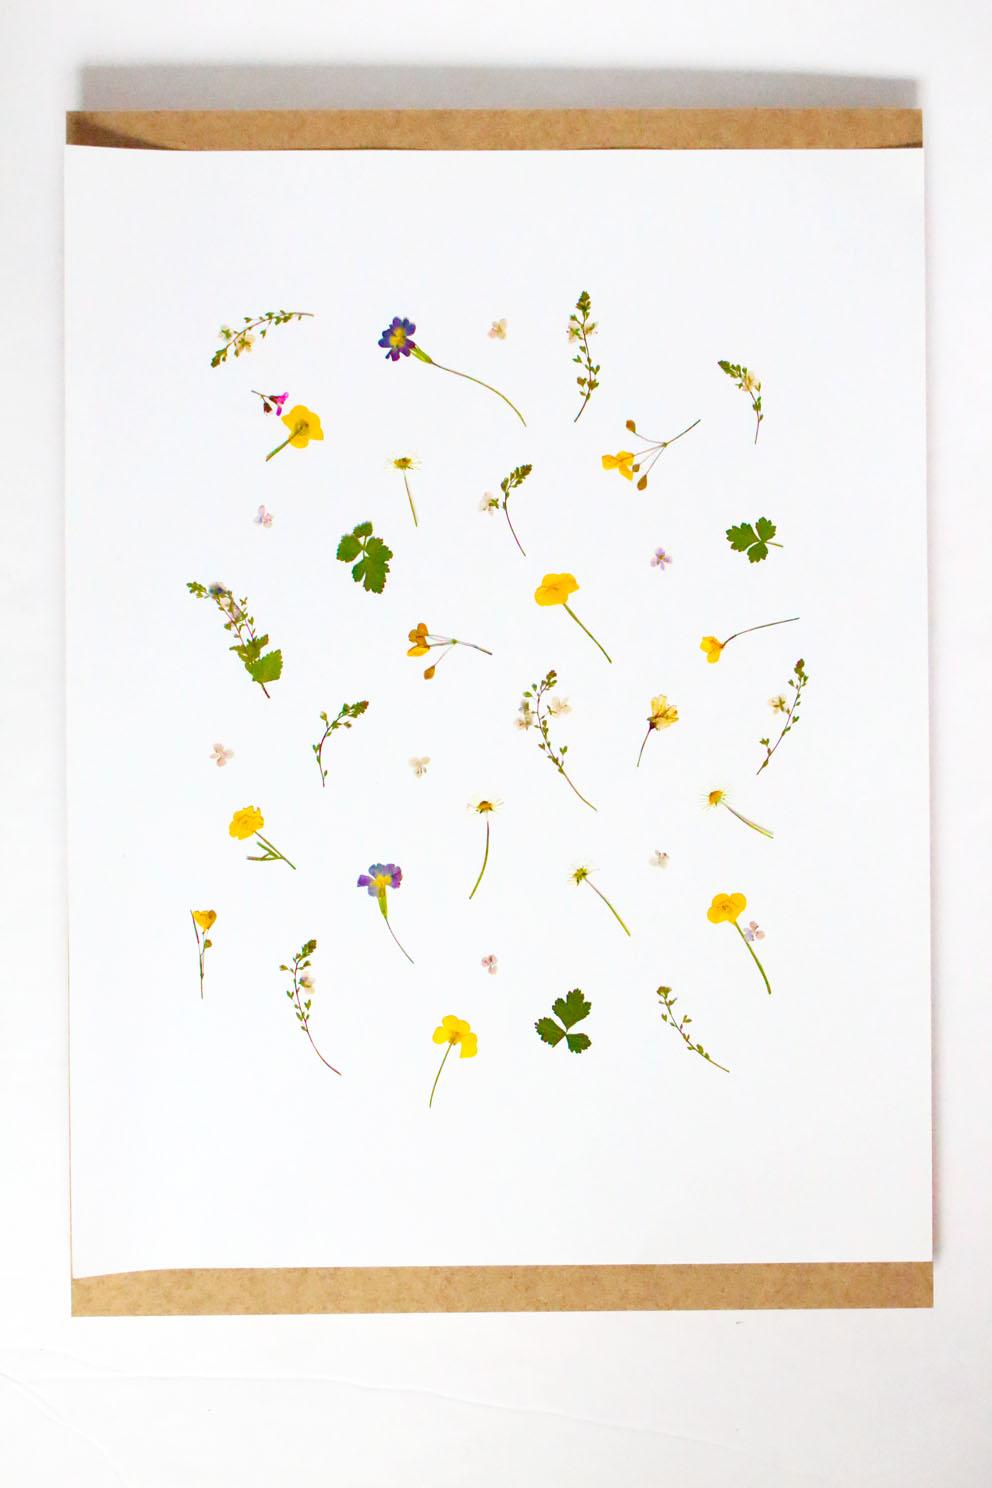 Pressed Flowers Frame Diy Home Decor Idea With Flowers Cline Lunakim